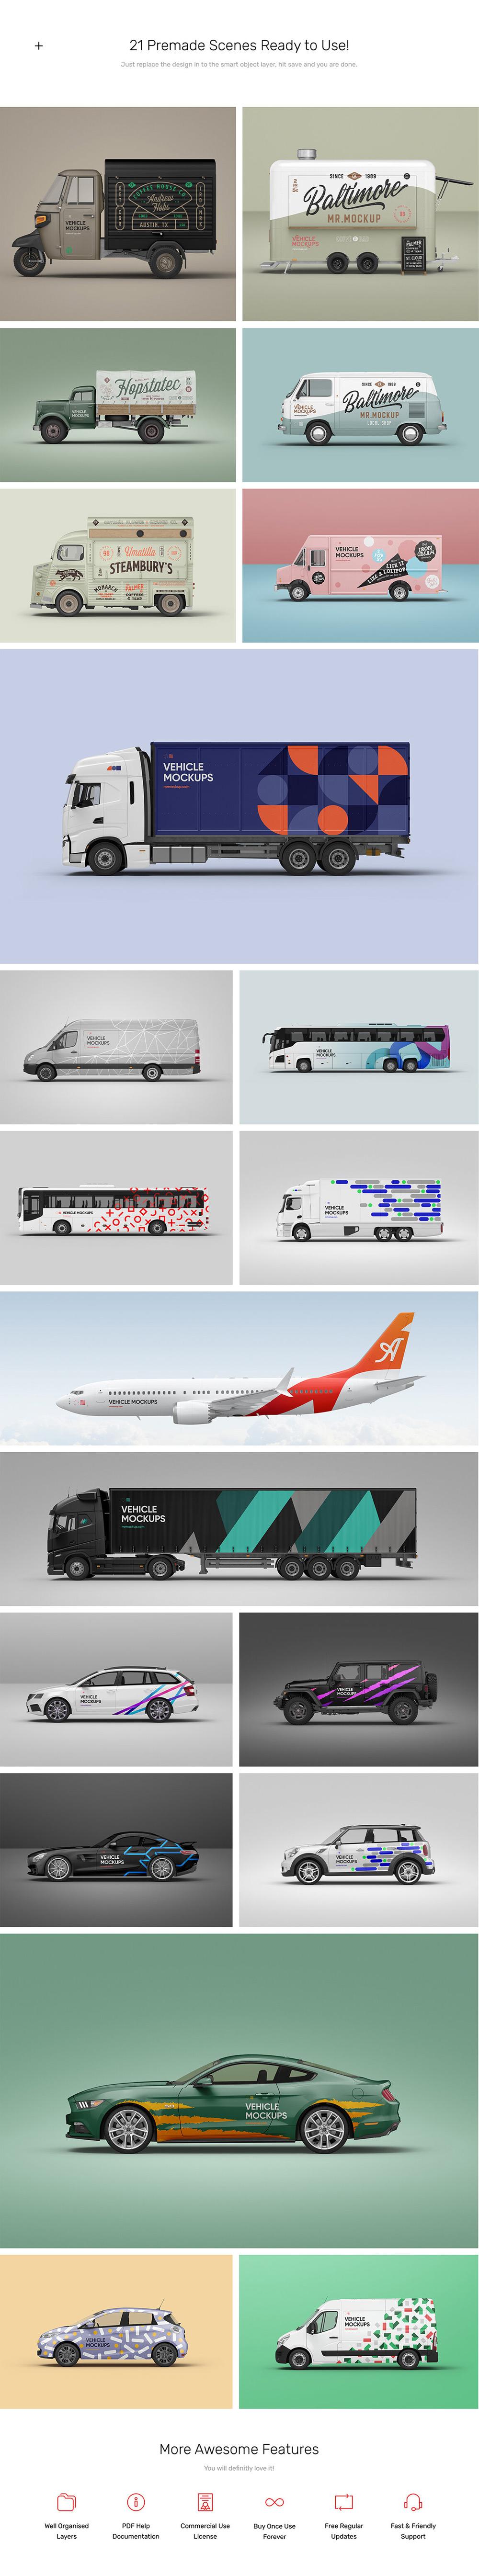 Vehicle Mockups for Adobe Photoshop